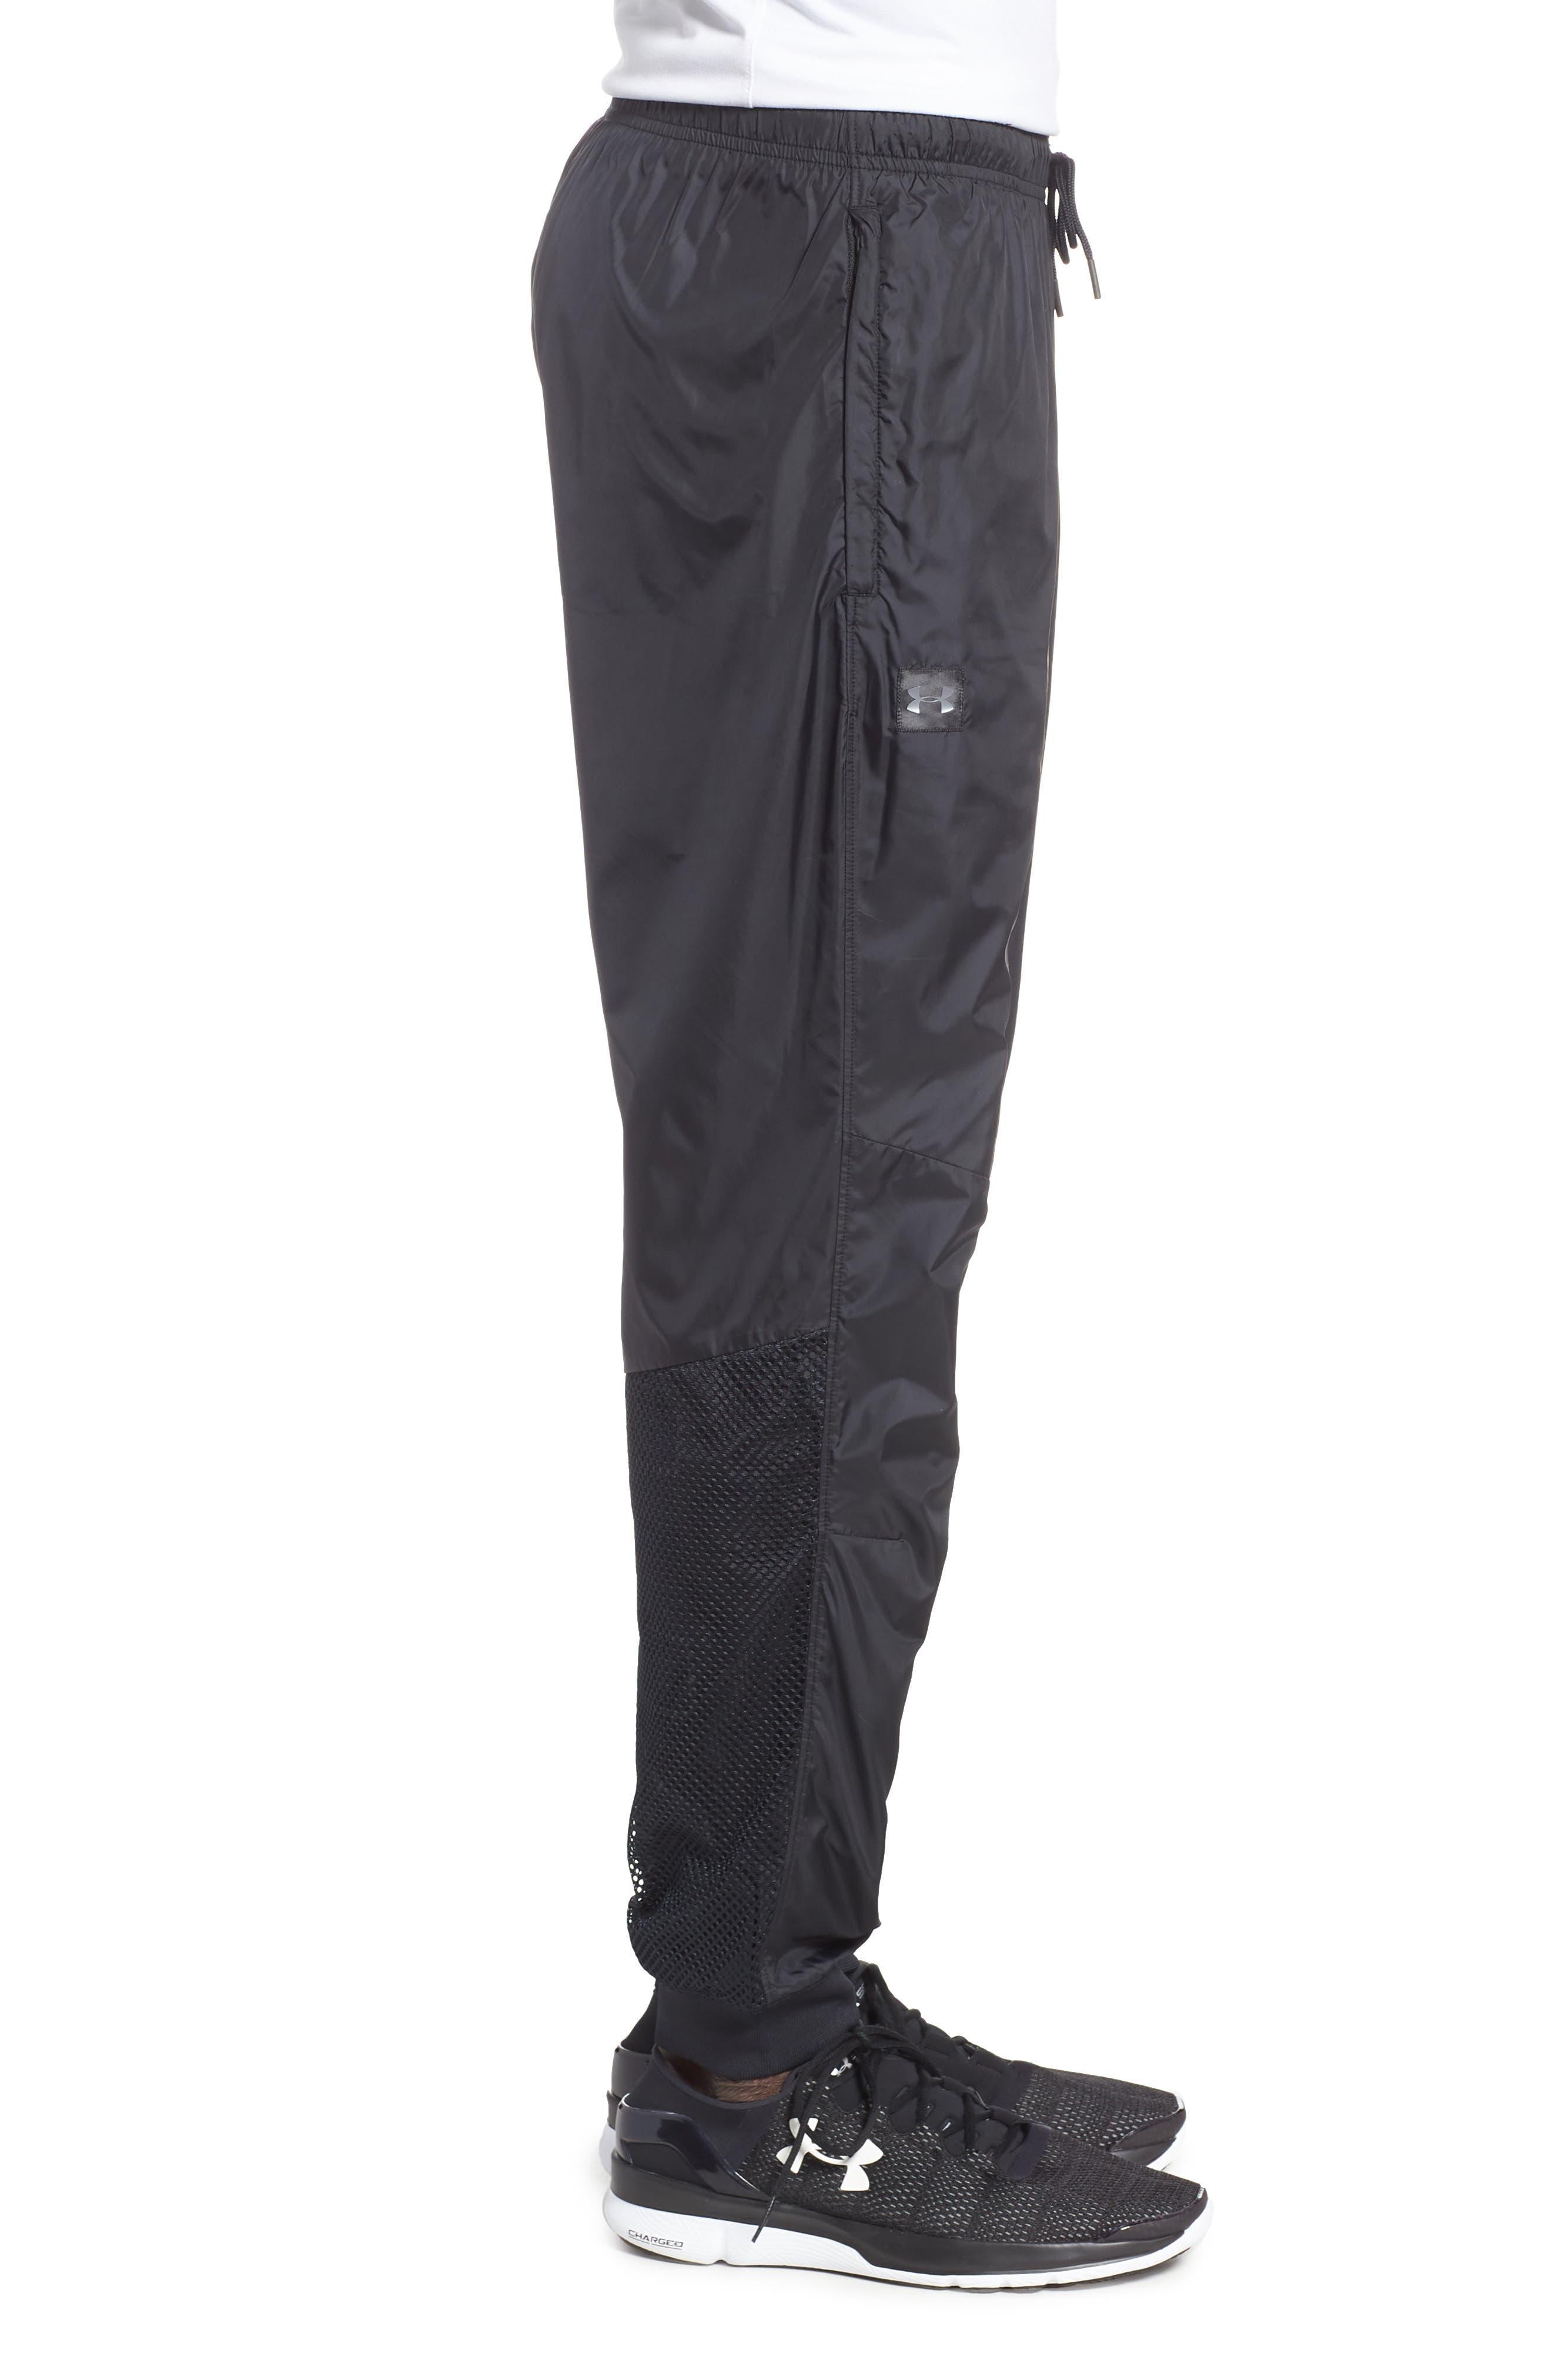 UNDER ARMOUR,                             Sportstyle Wind Pants,                             Alternate thumbnail 3, color,                             BLACK